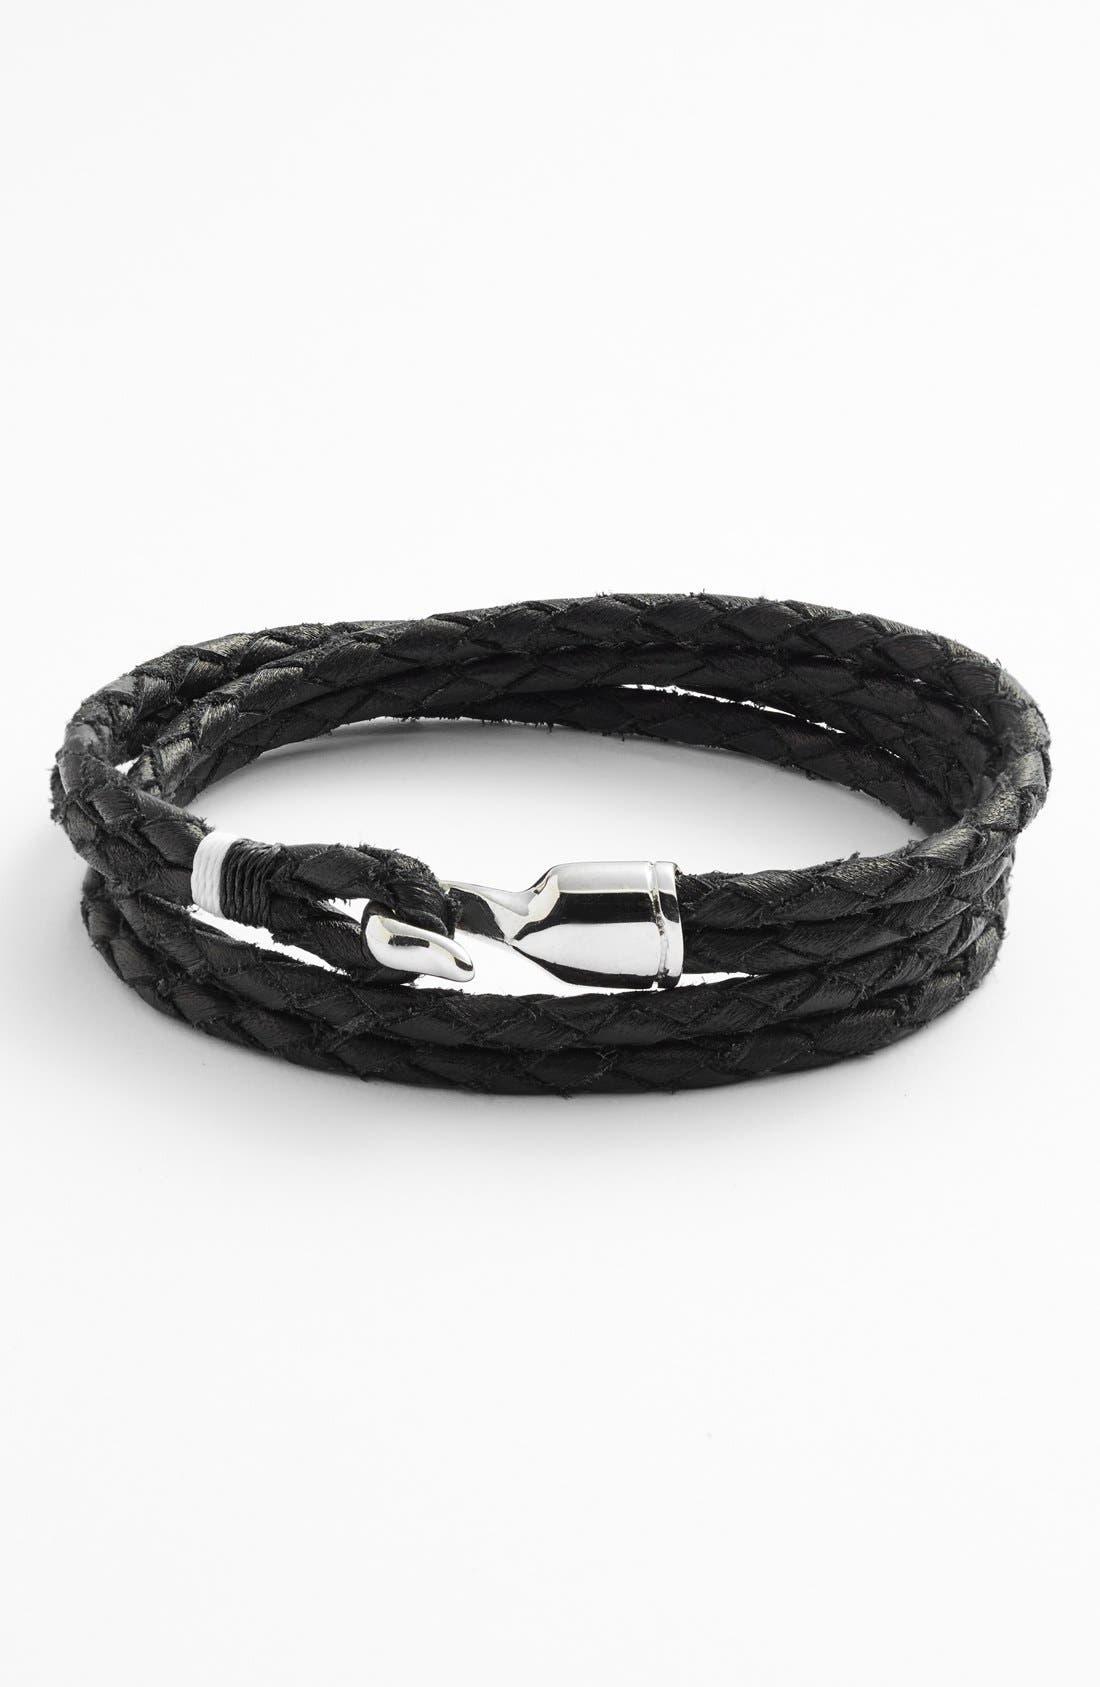 Miansai Mens Trice Double-Wrap Bracelet GkBVoYLheu